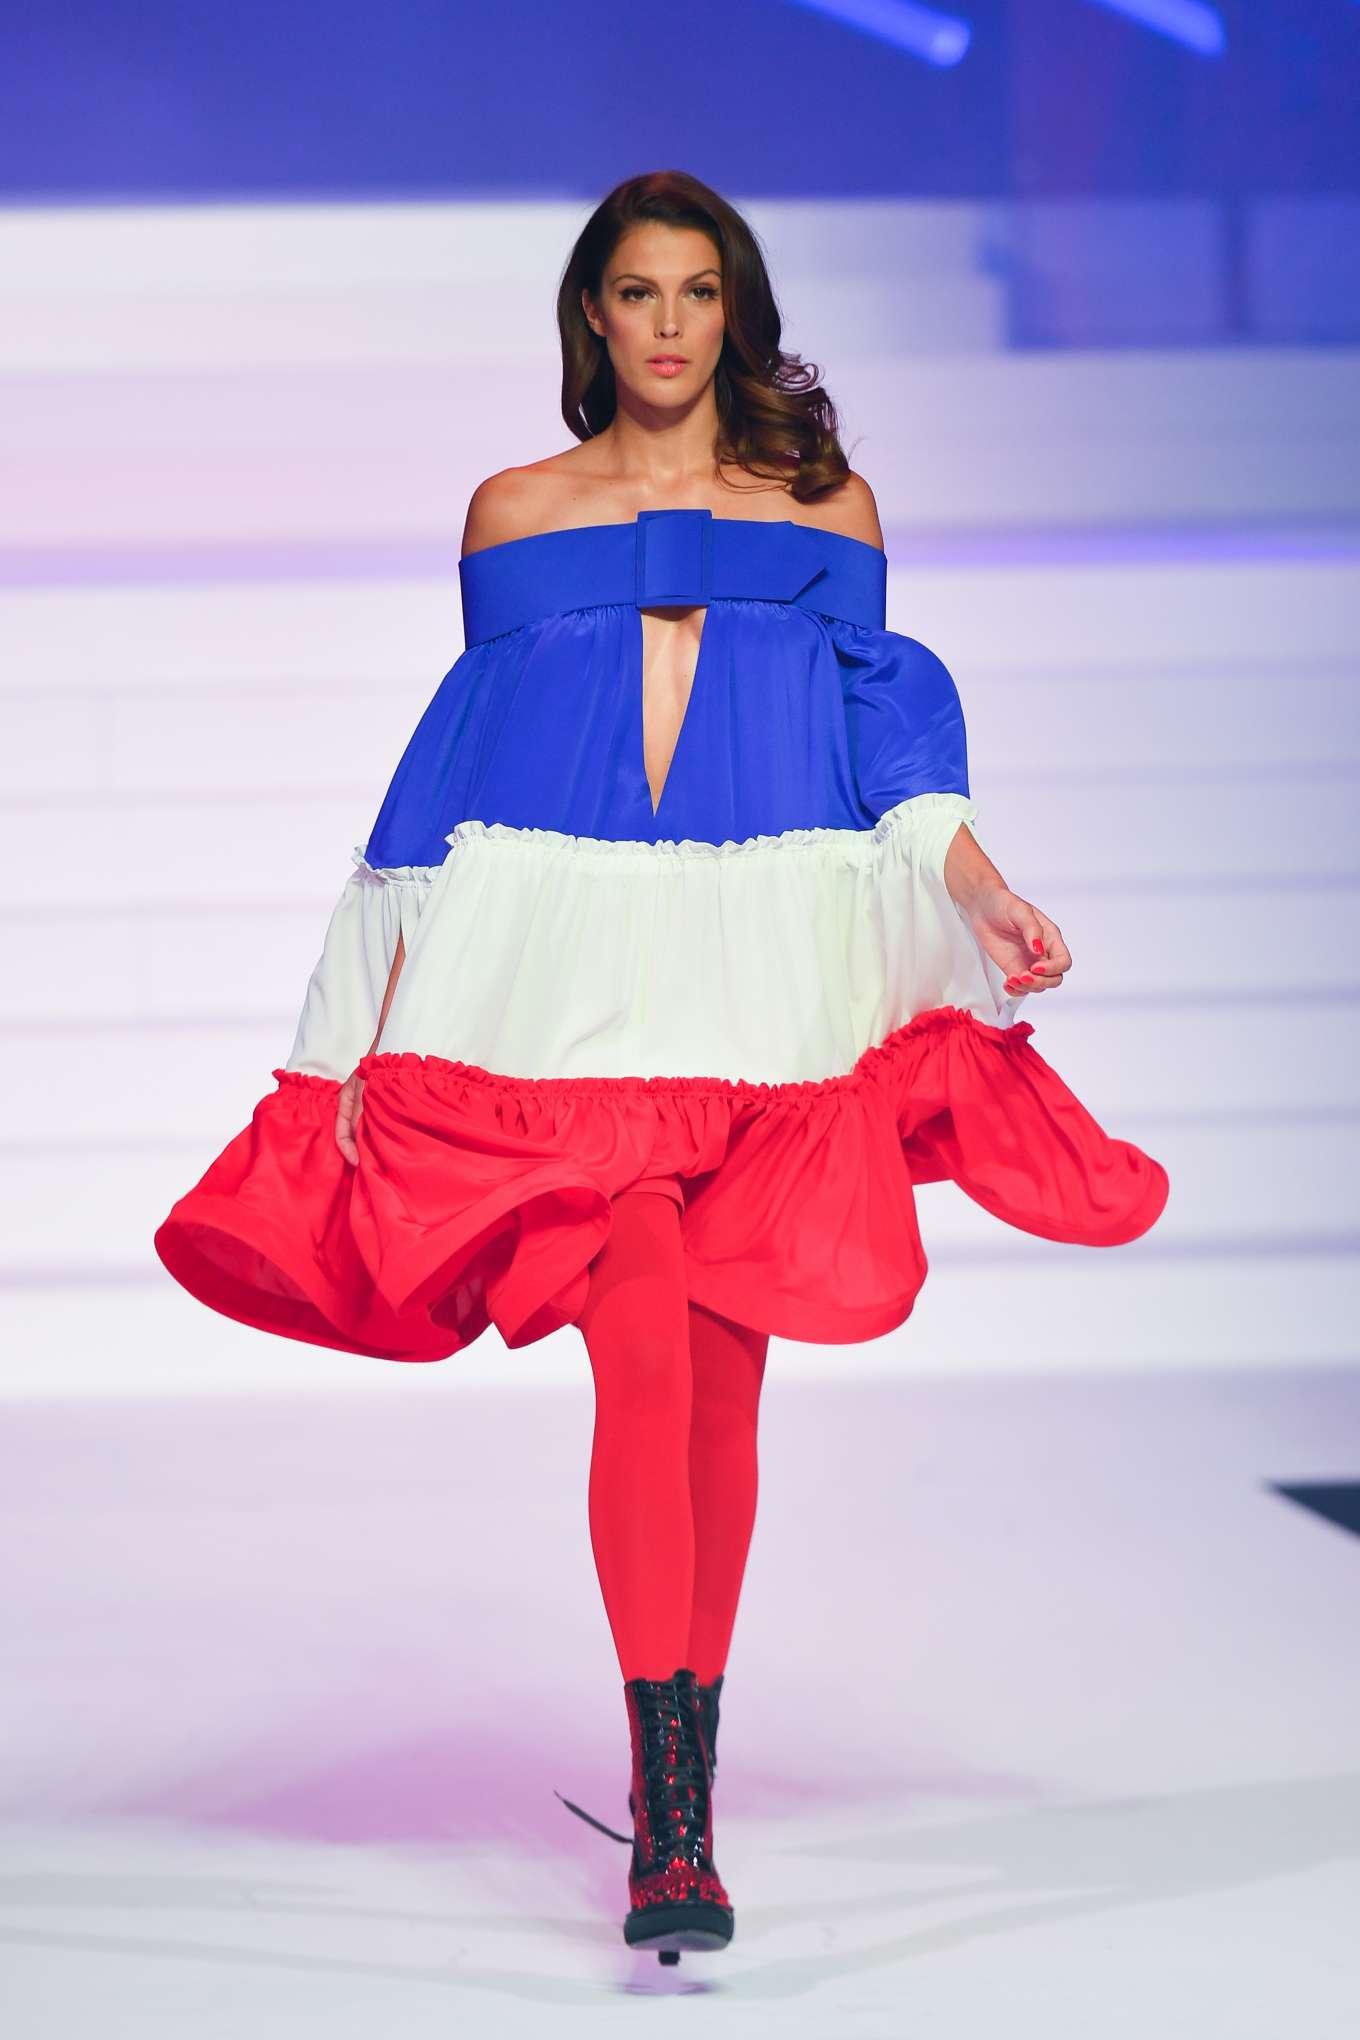 Iris Mittenaere 2020 : Iris Mittenaere – Jean-Paul Gaultier Runway Show in Paris-16